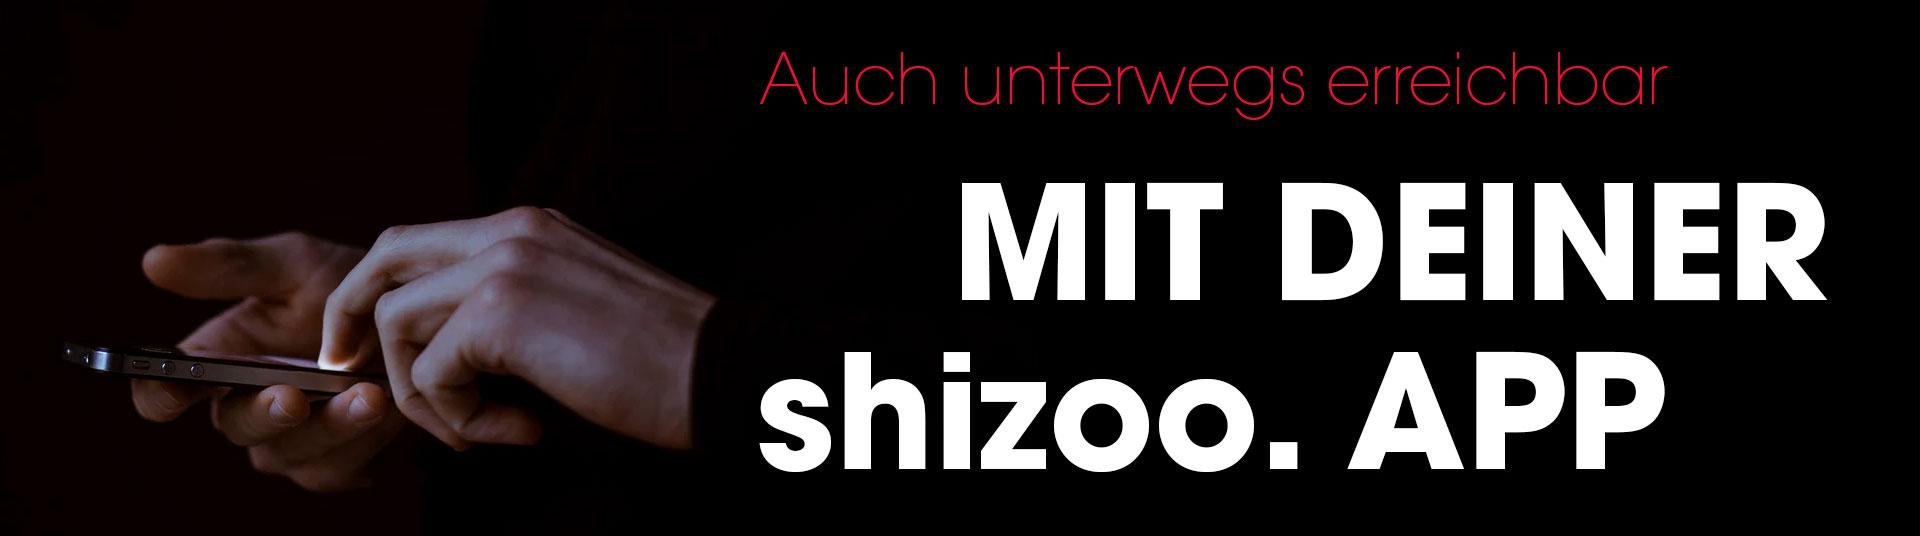 shizoo. Sushi Lieferservice München shizoo. App